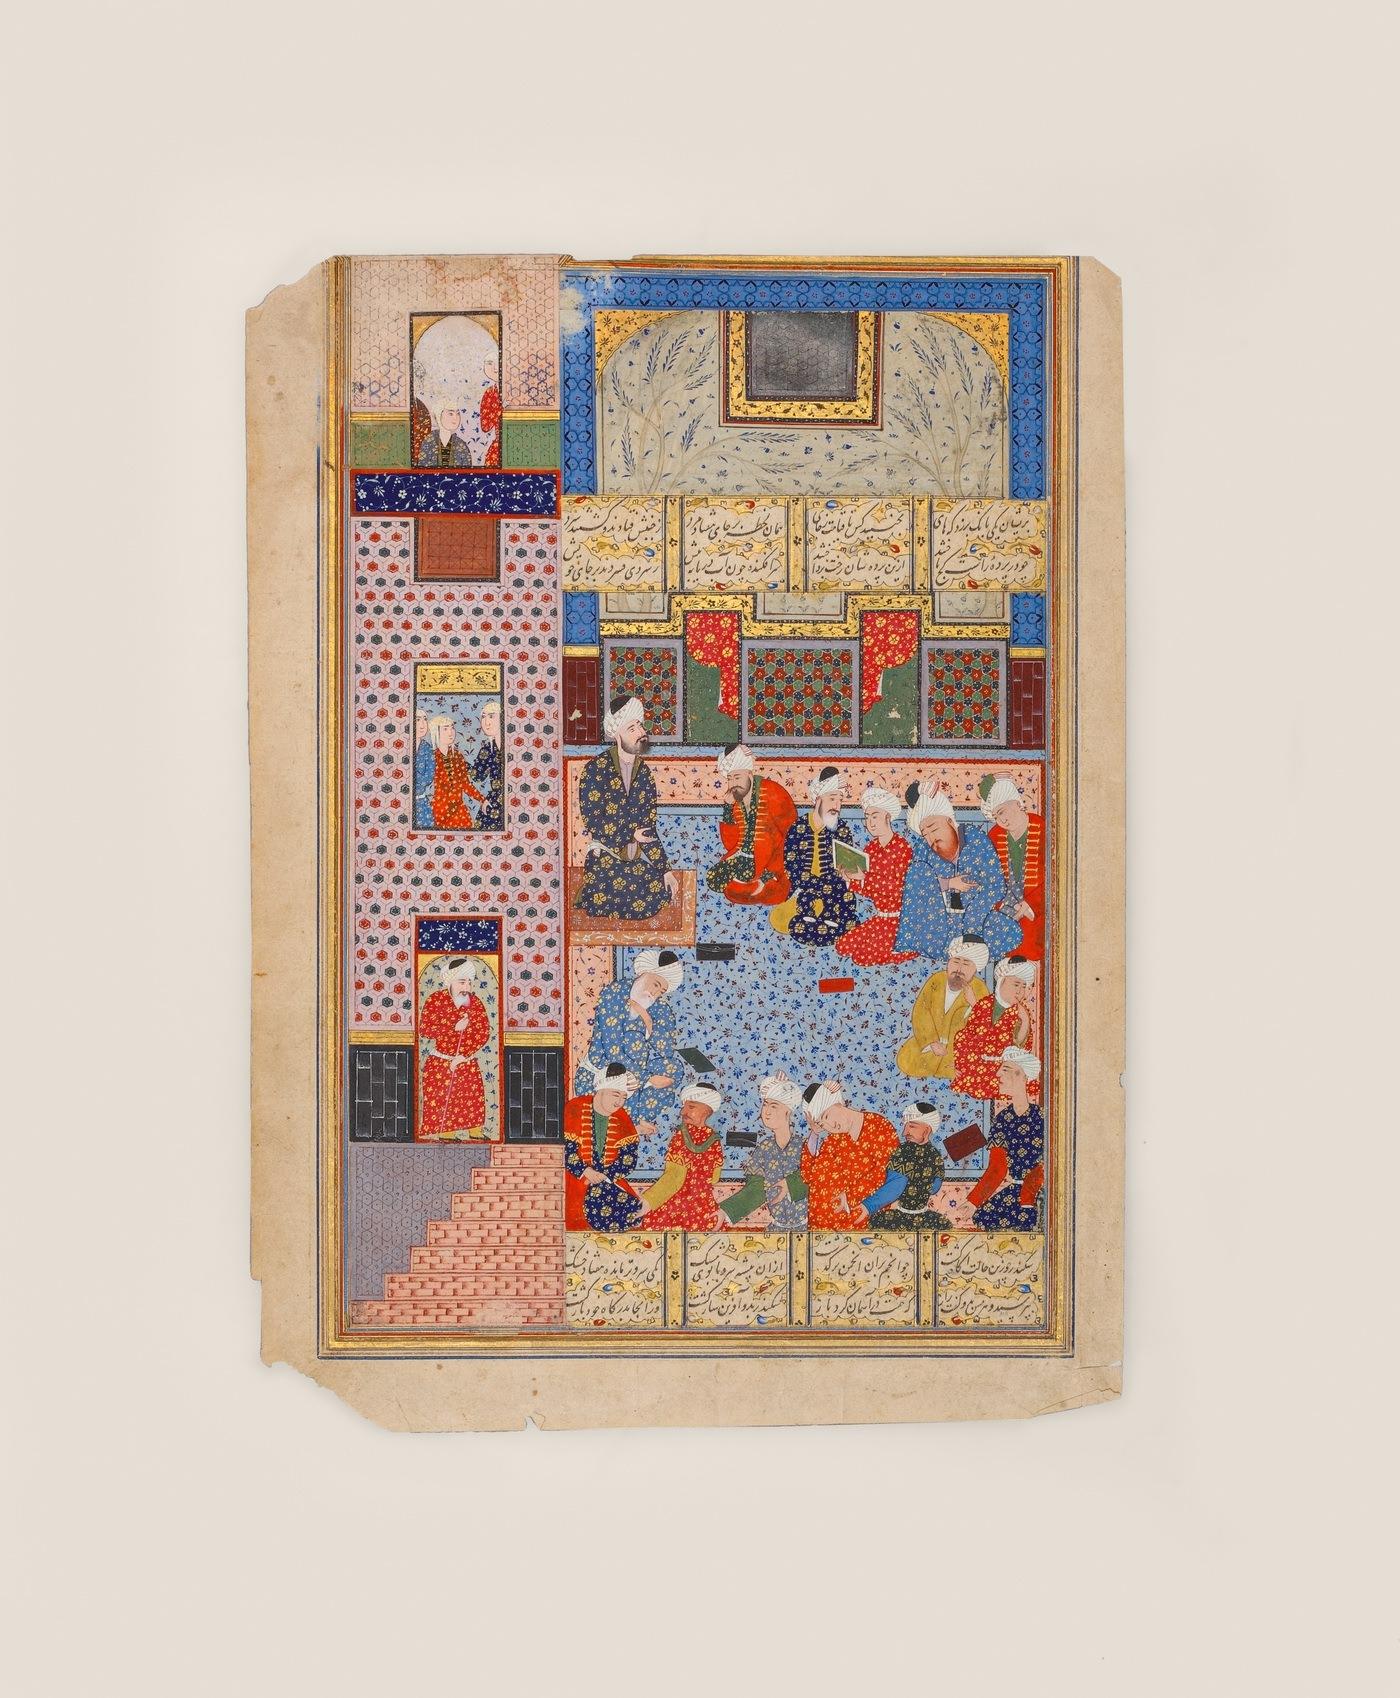 Лист из рукописи Низами Ганджави. Хамсе (Пятерица). Миниатюра Собрание мудрецов. Иран, Шираз. 1560-1580. Бумага, тушь, краски, золото. Фонда Марджани